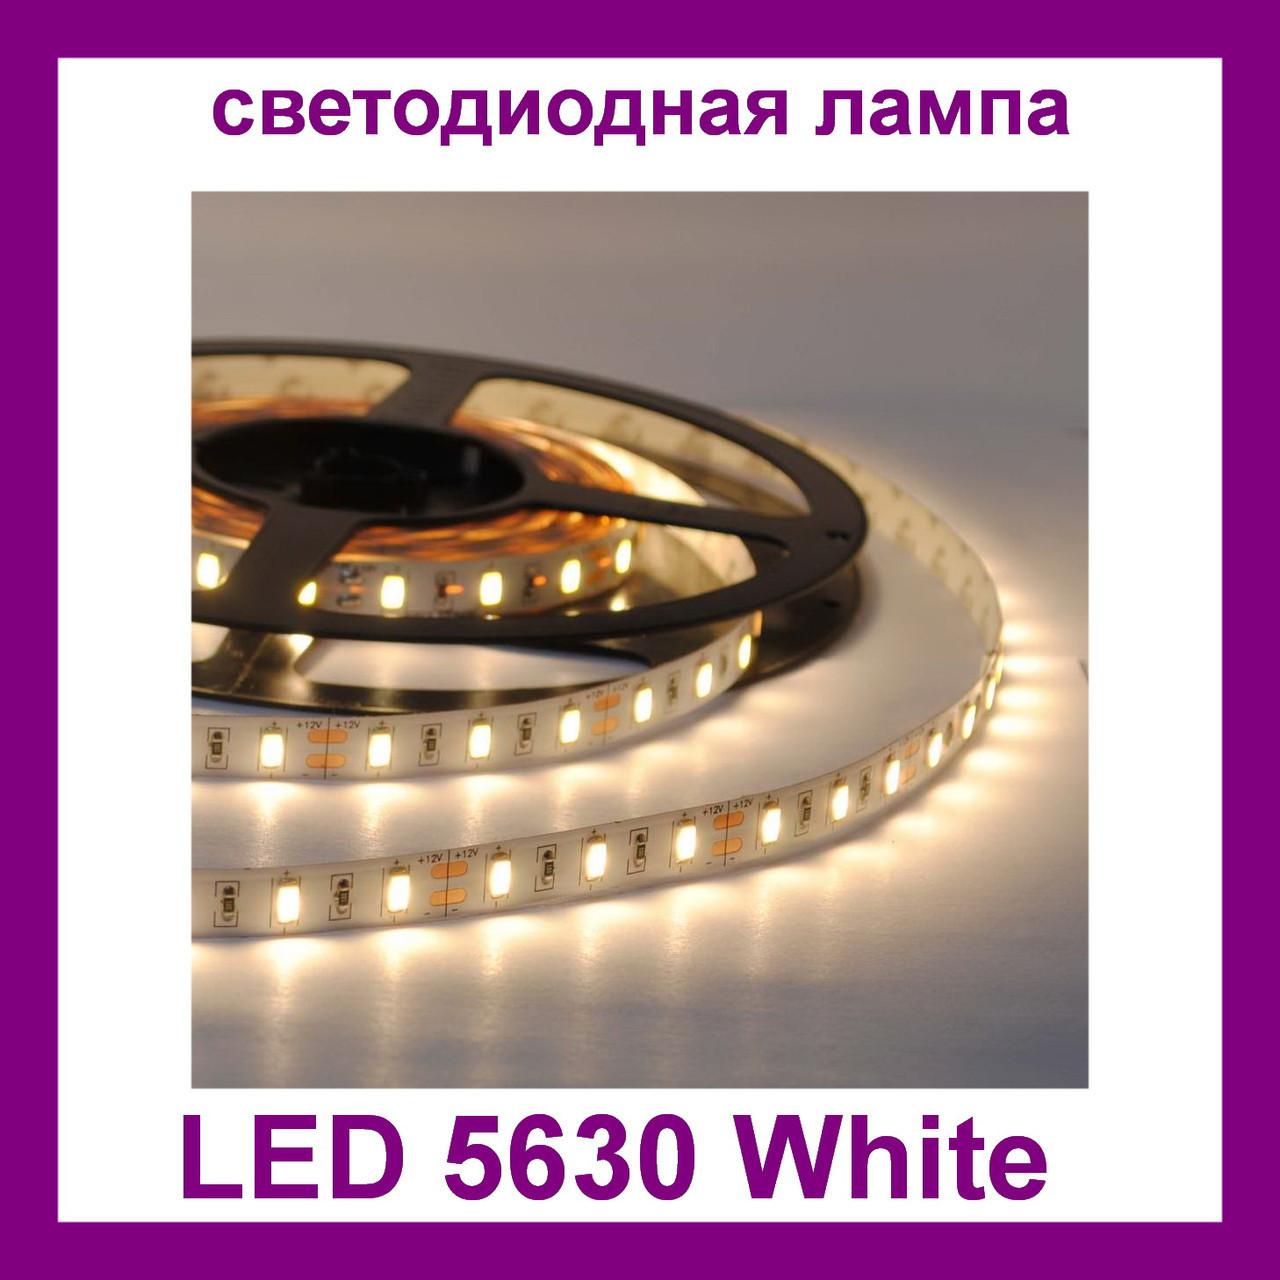 Светодиодная лента LED 5630 White PR3